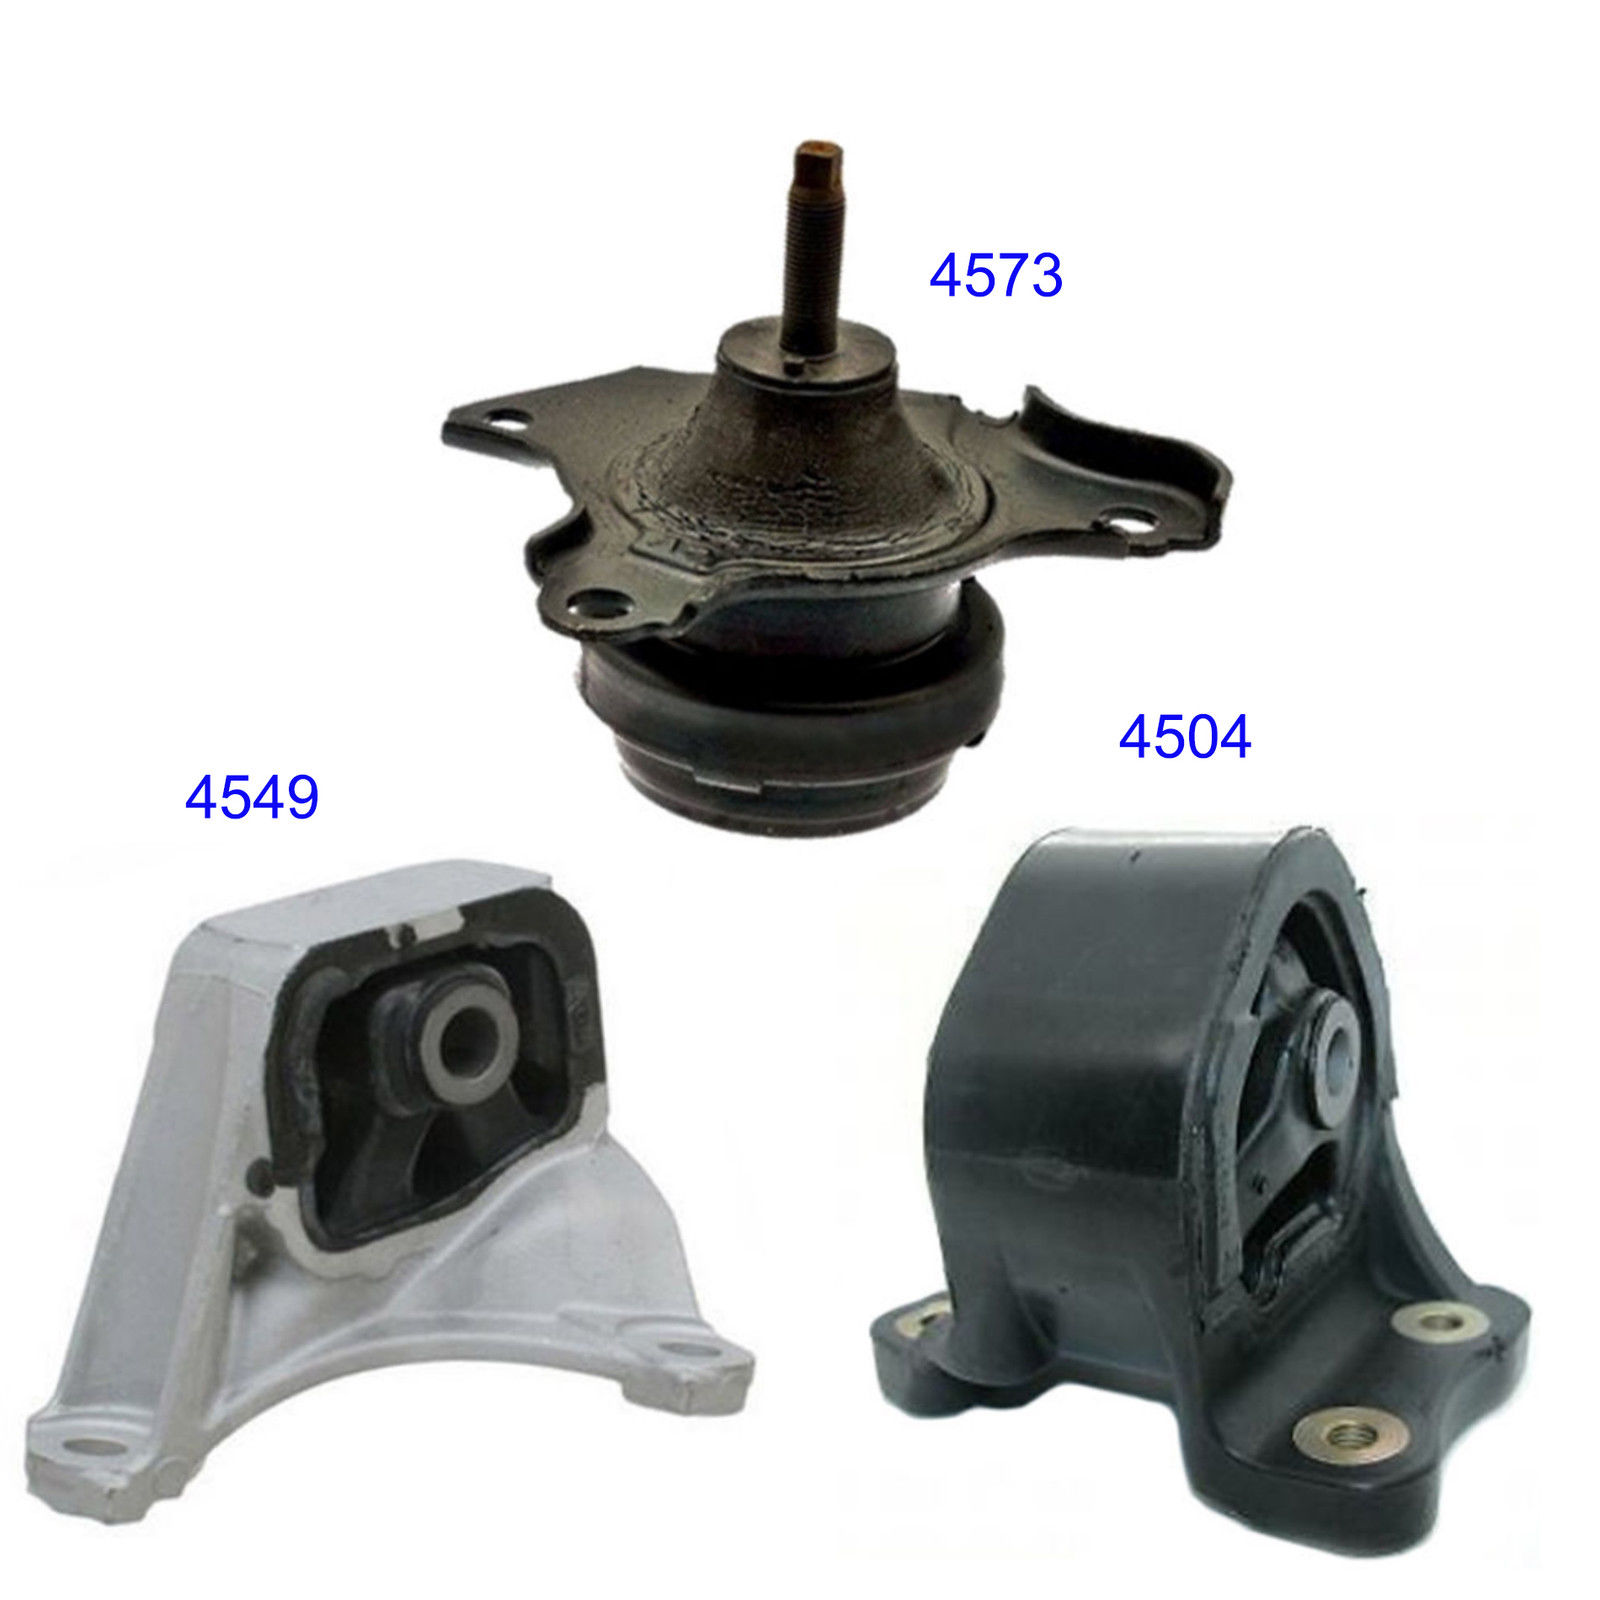 Engine Motor Mount Set 3PCS M1102 2003-2011 For Honda Element 2.4L Manual Trans